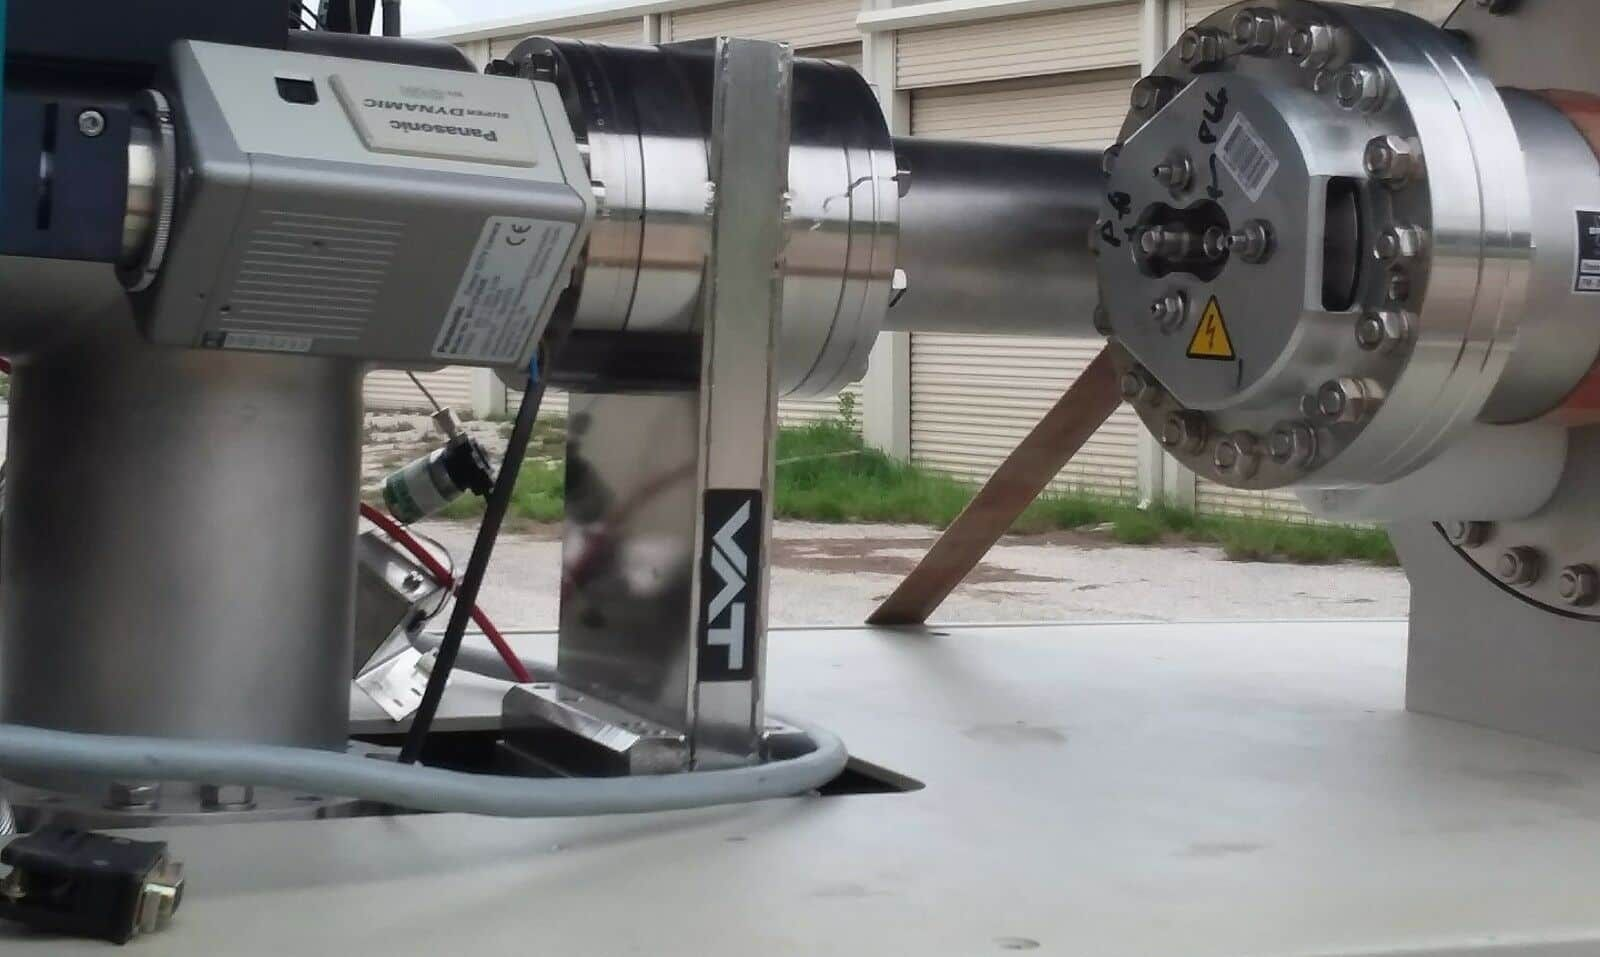 Bruker Reflex III Scout 384 MALDI-ToF Mass Spectrometer 2GHz blazers Ajax Cathode